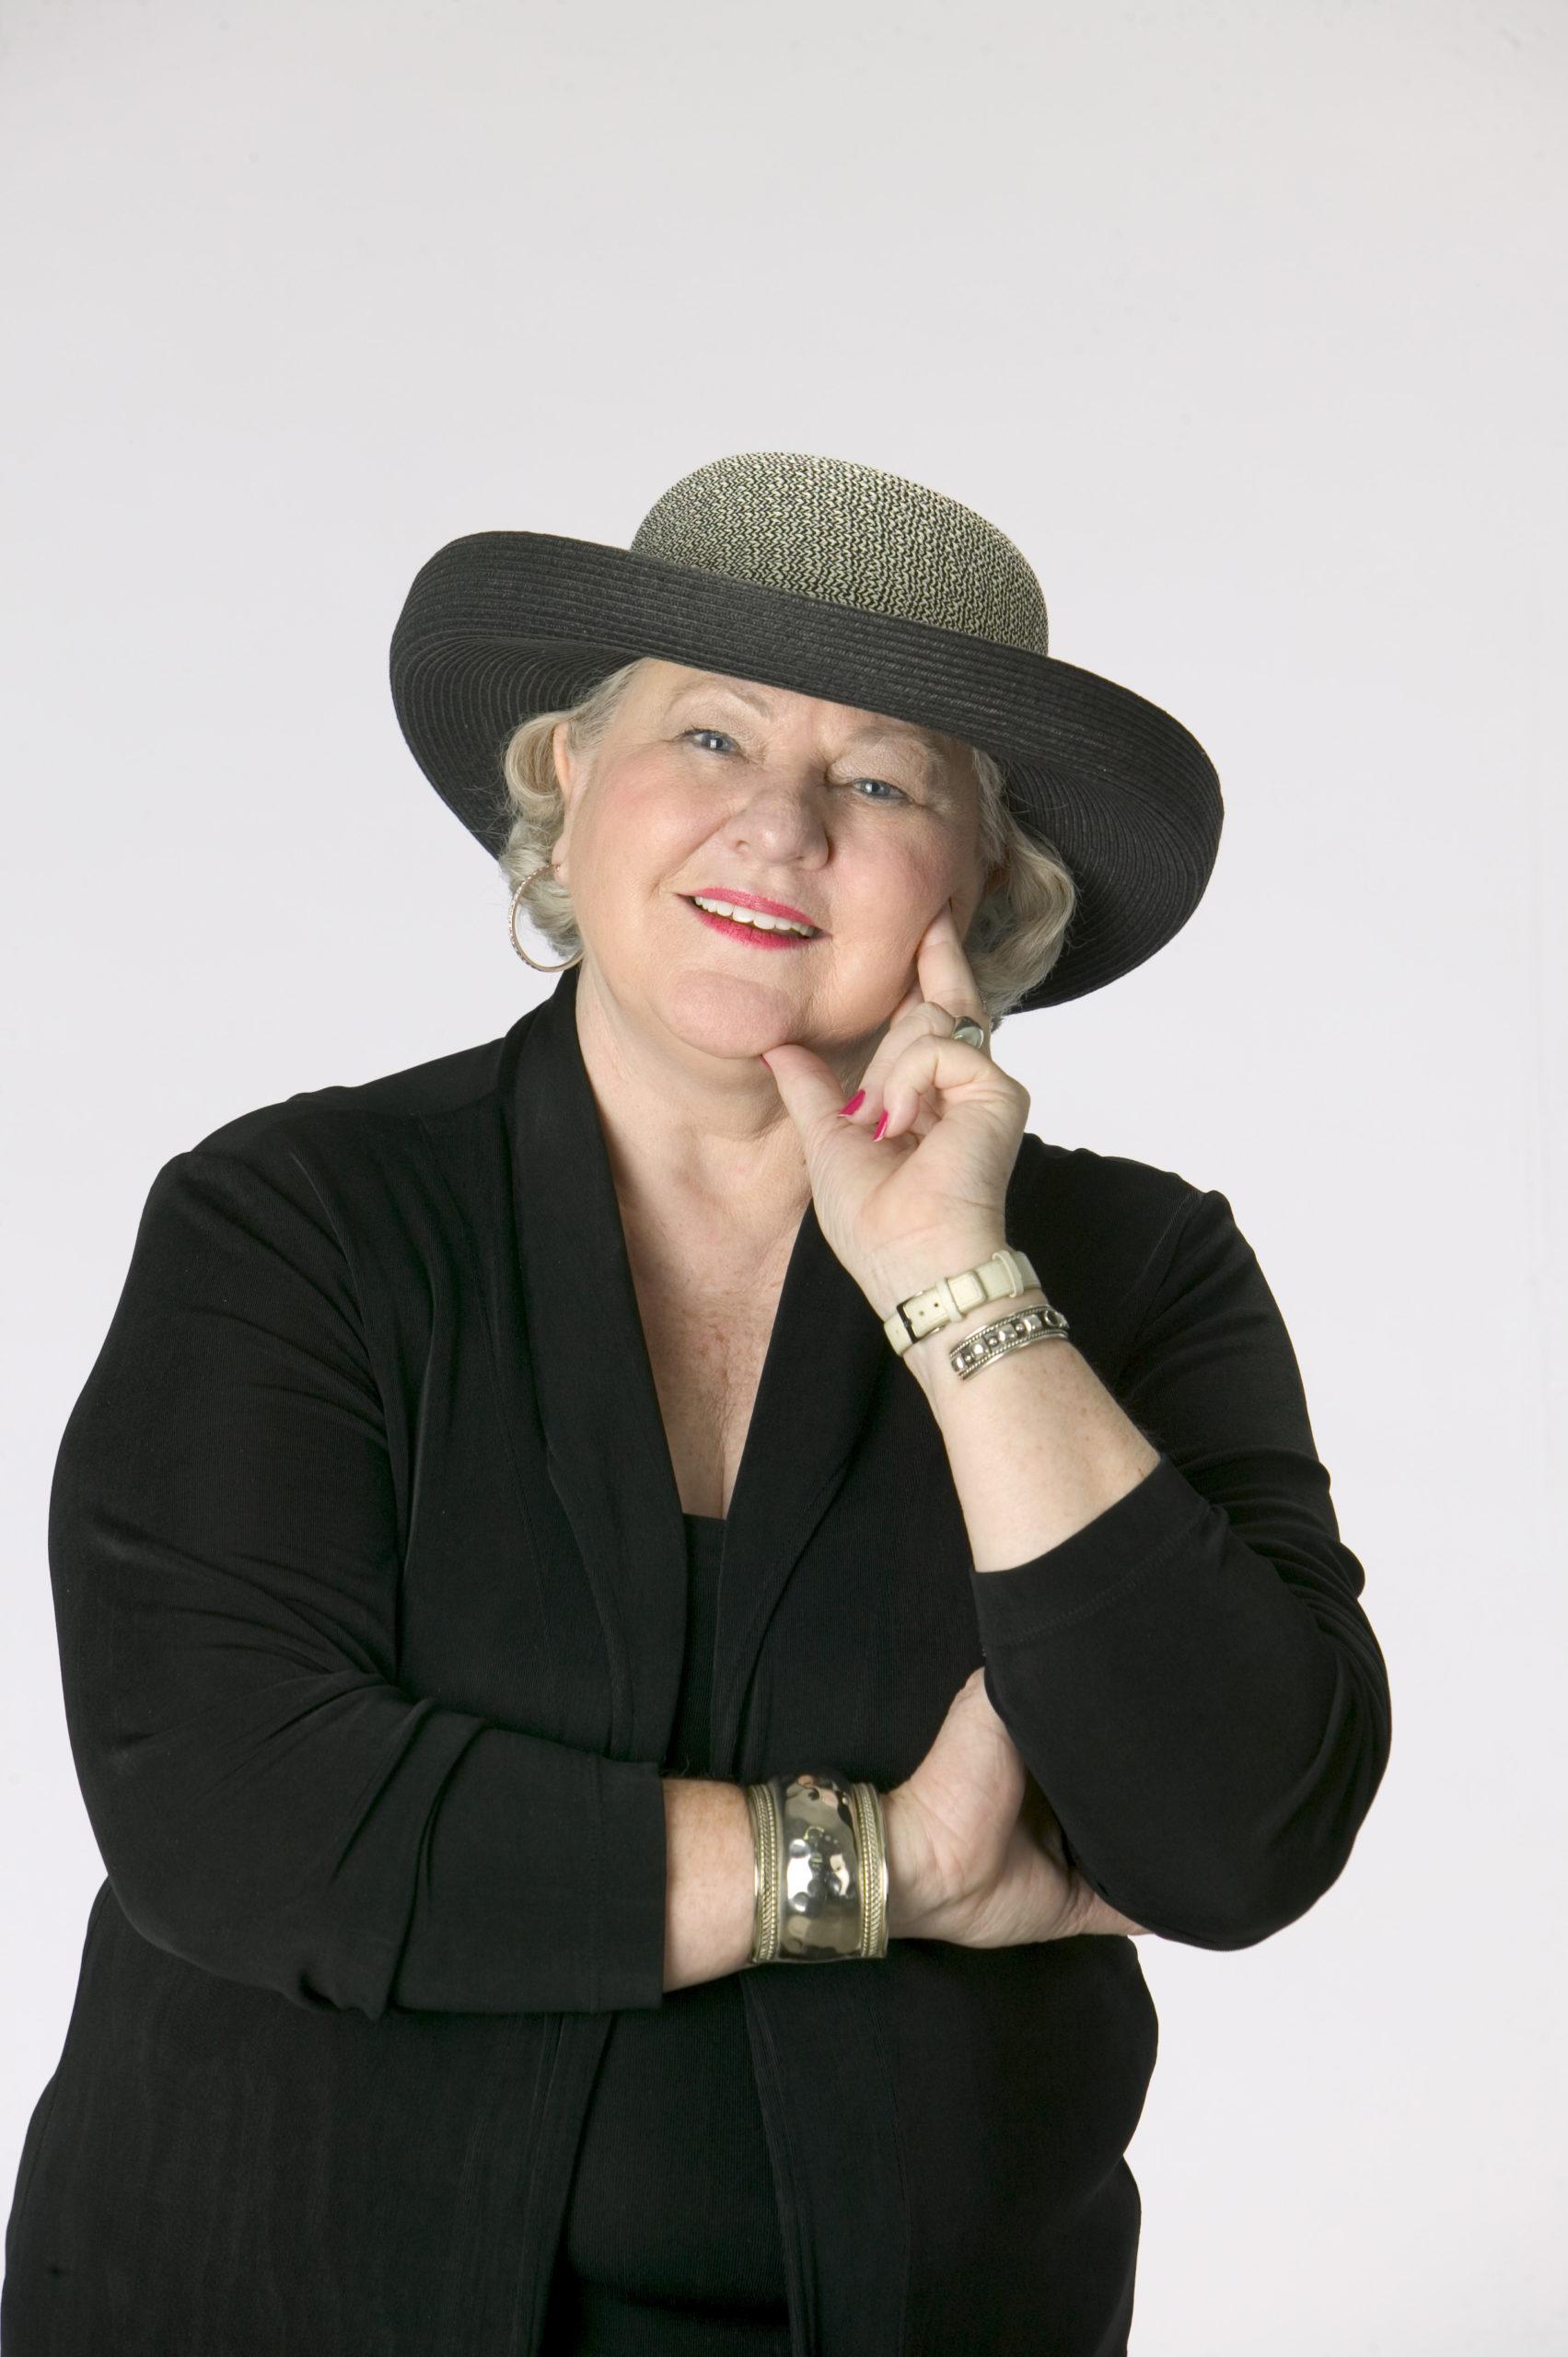 Motivational speaker Pat McGill